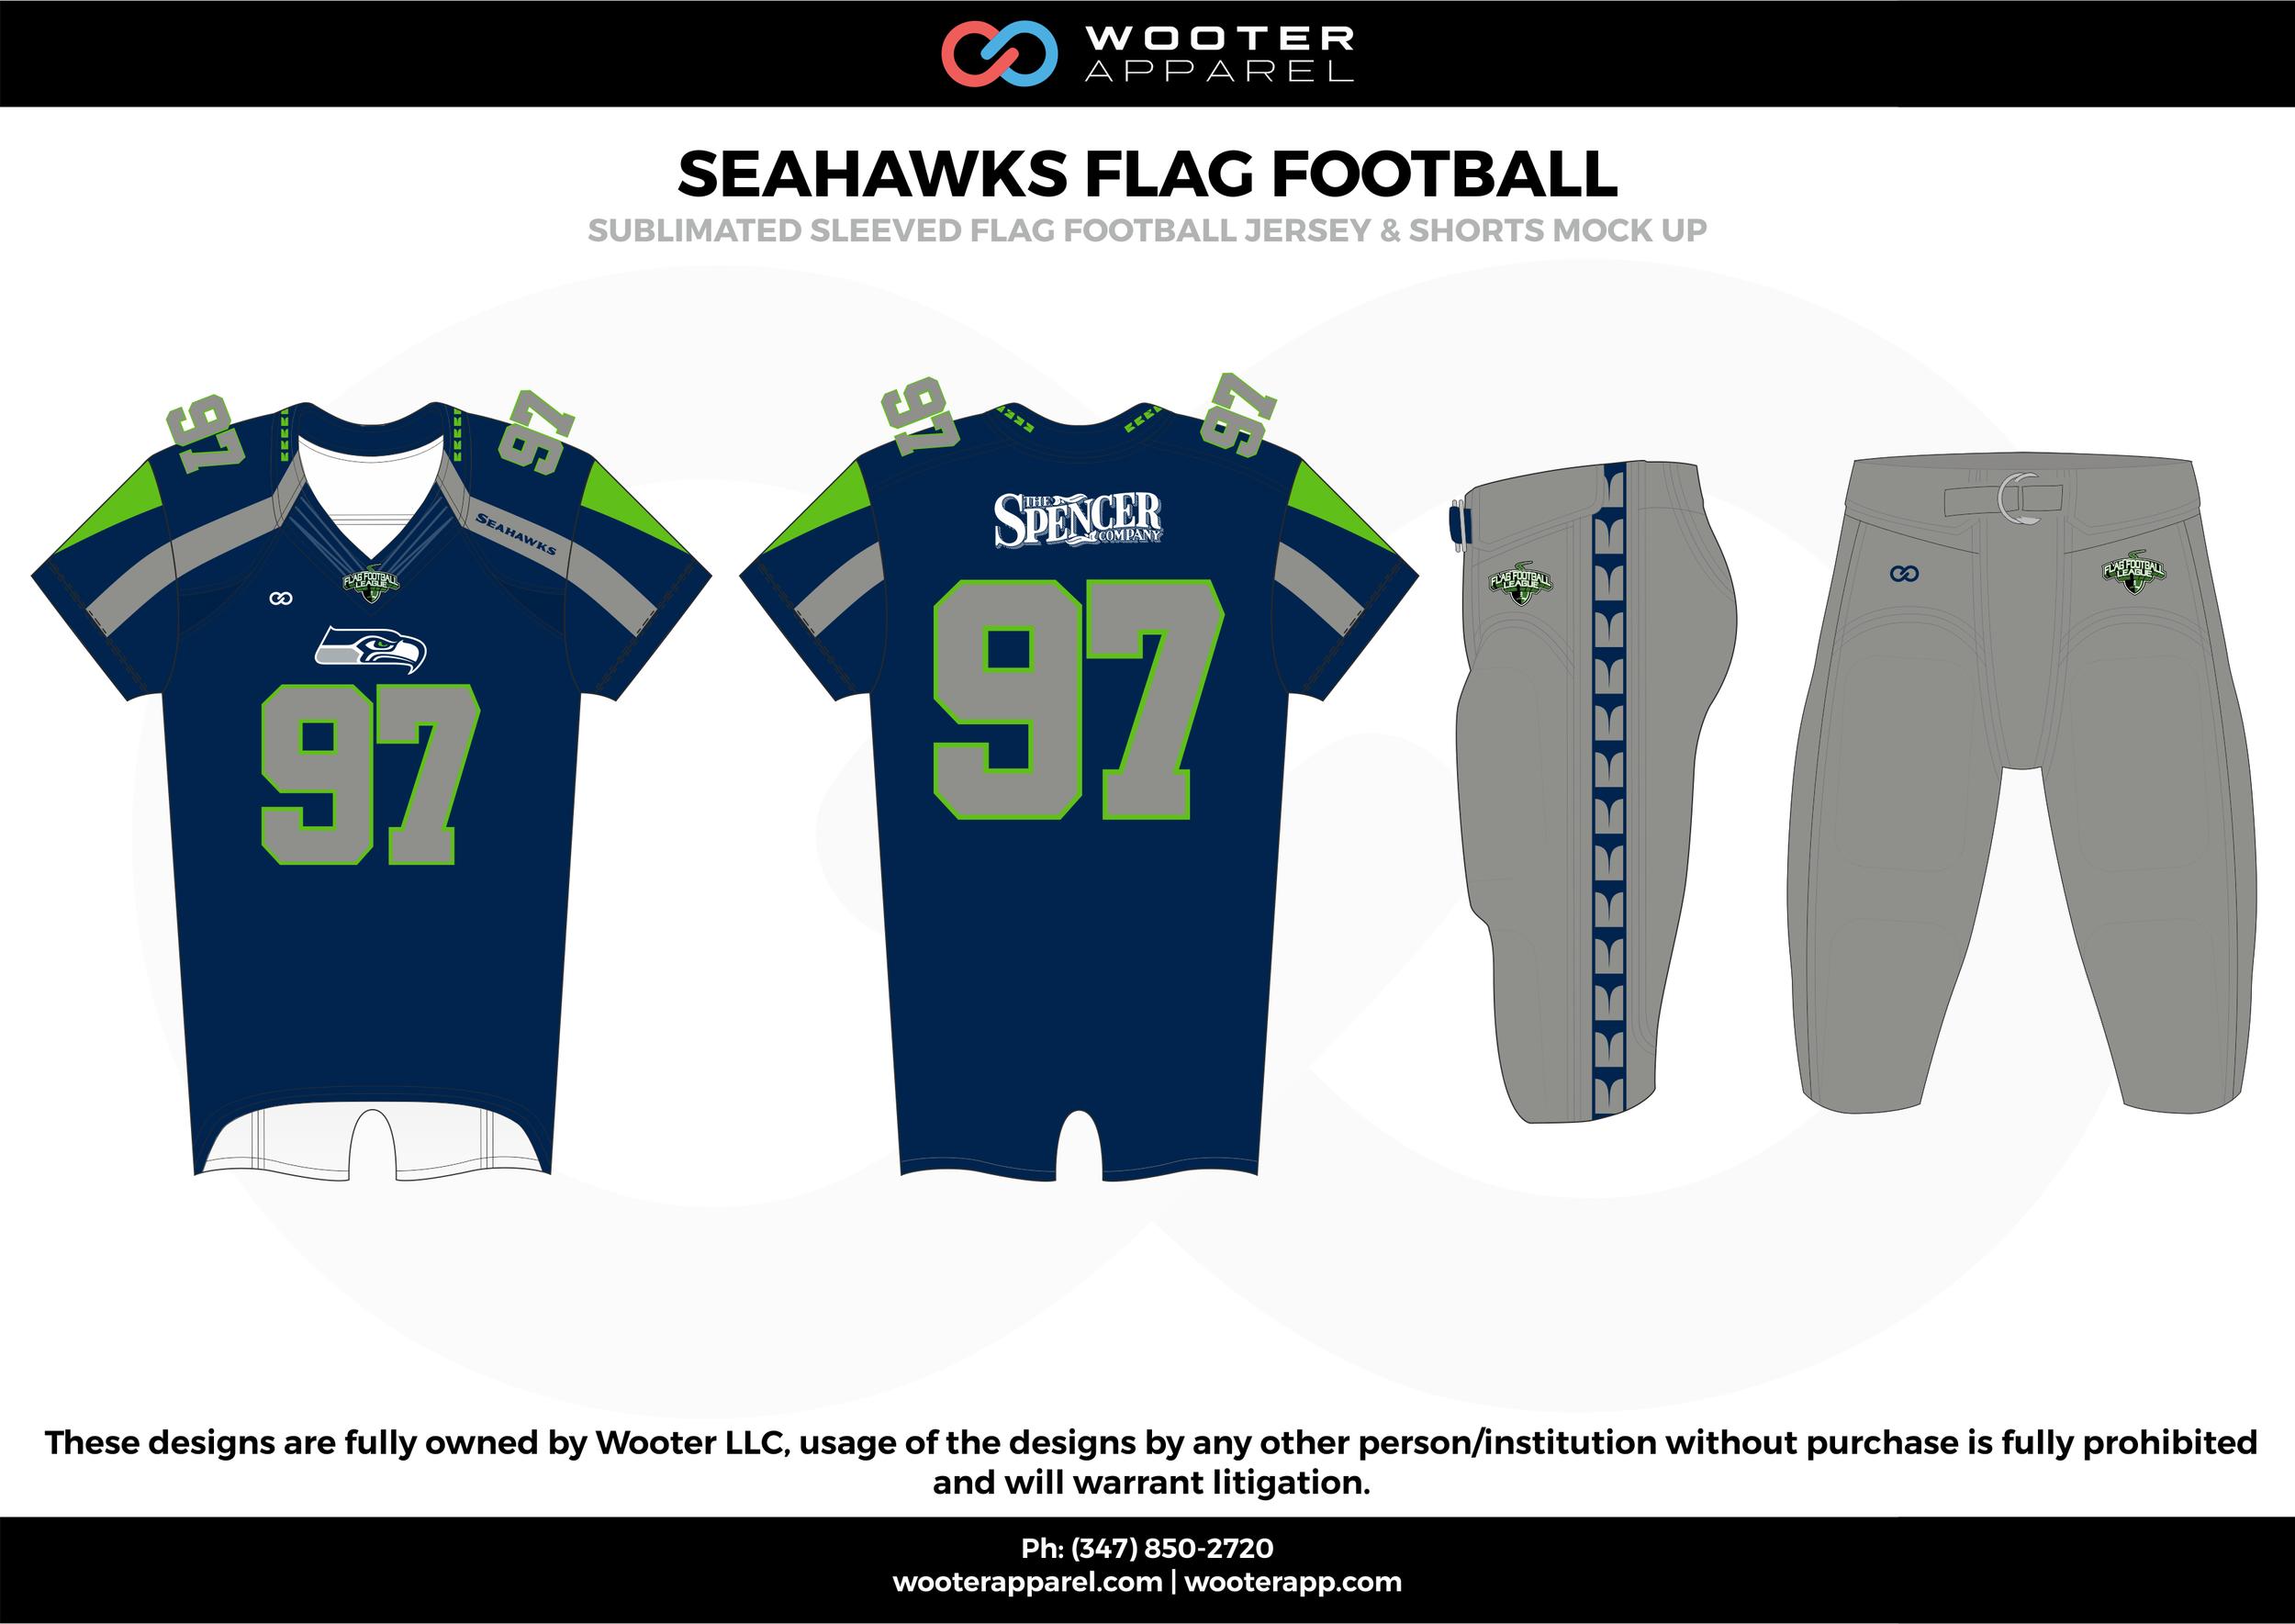 SEAHAWKS FLAG FOOTBALL blue gray green flag football uniforms jerseys pants